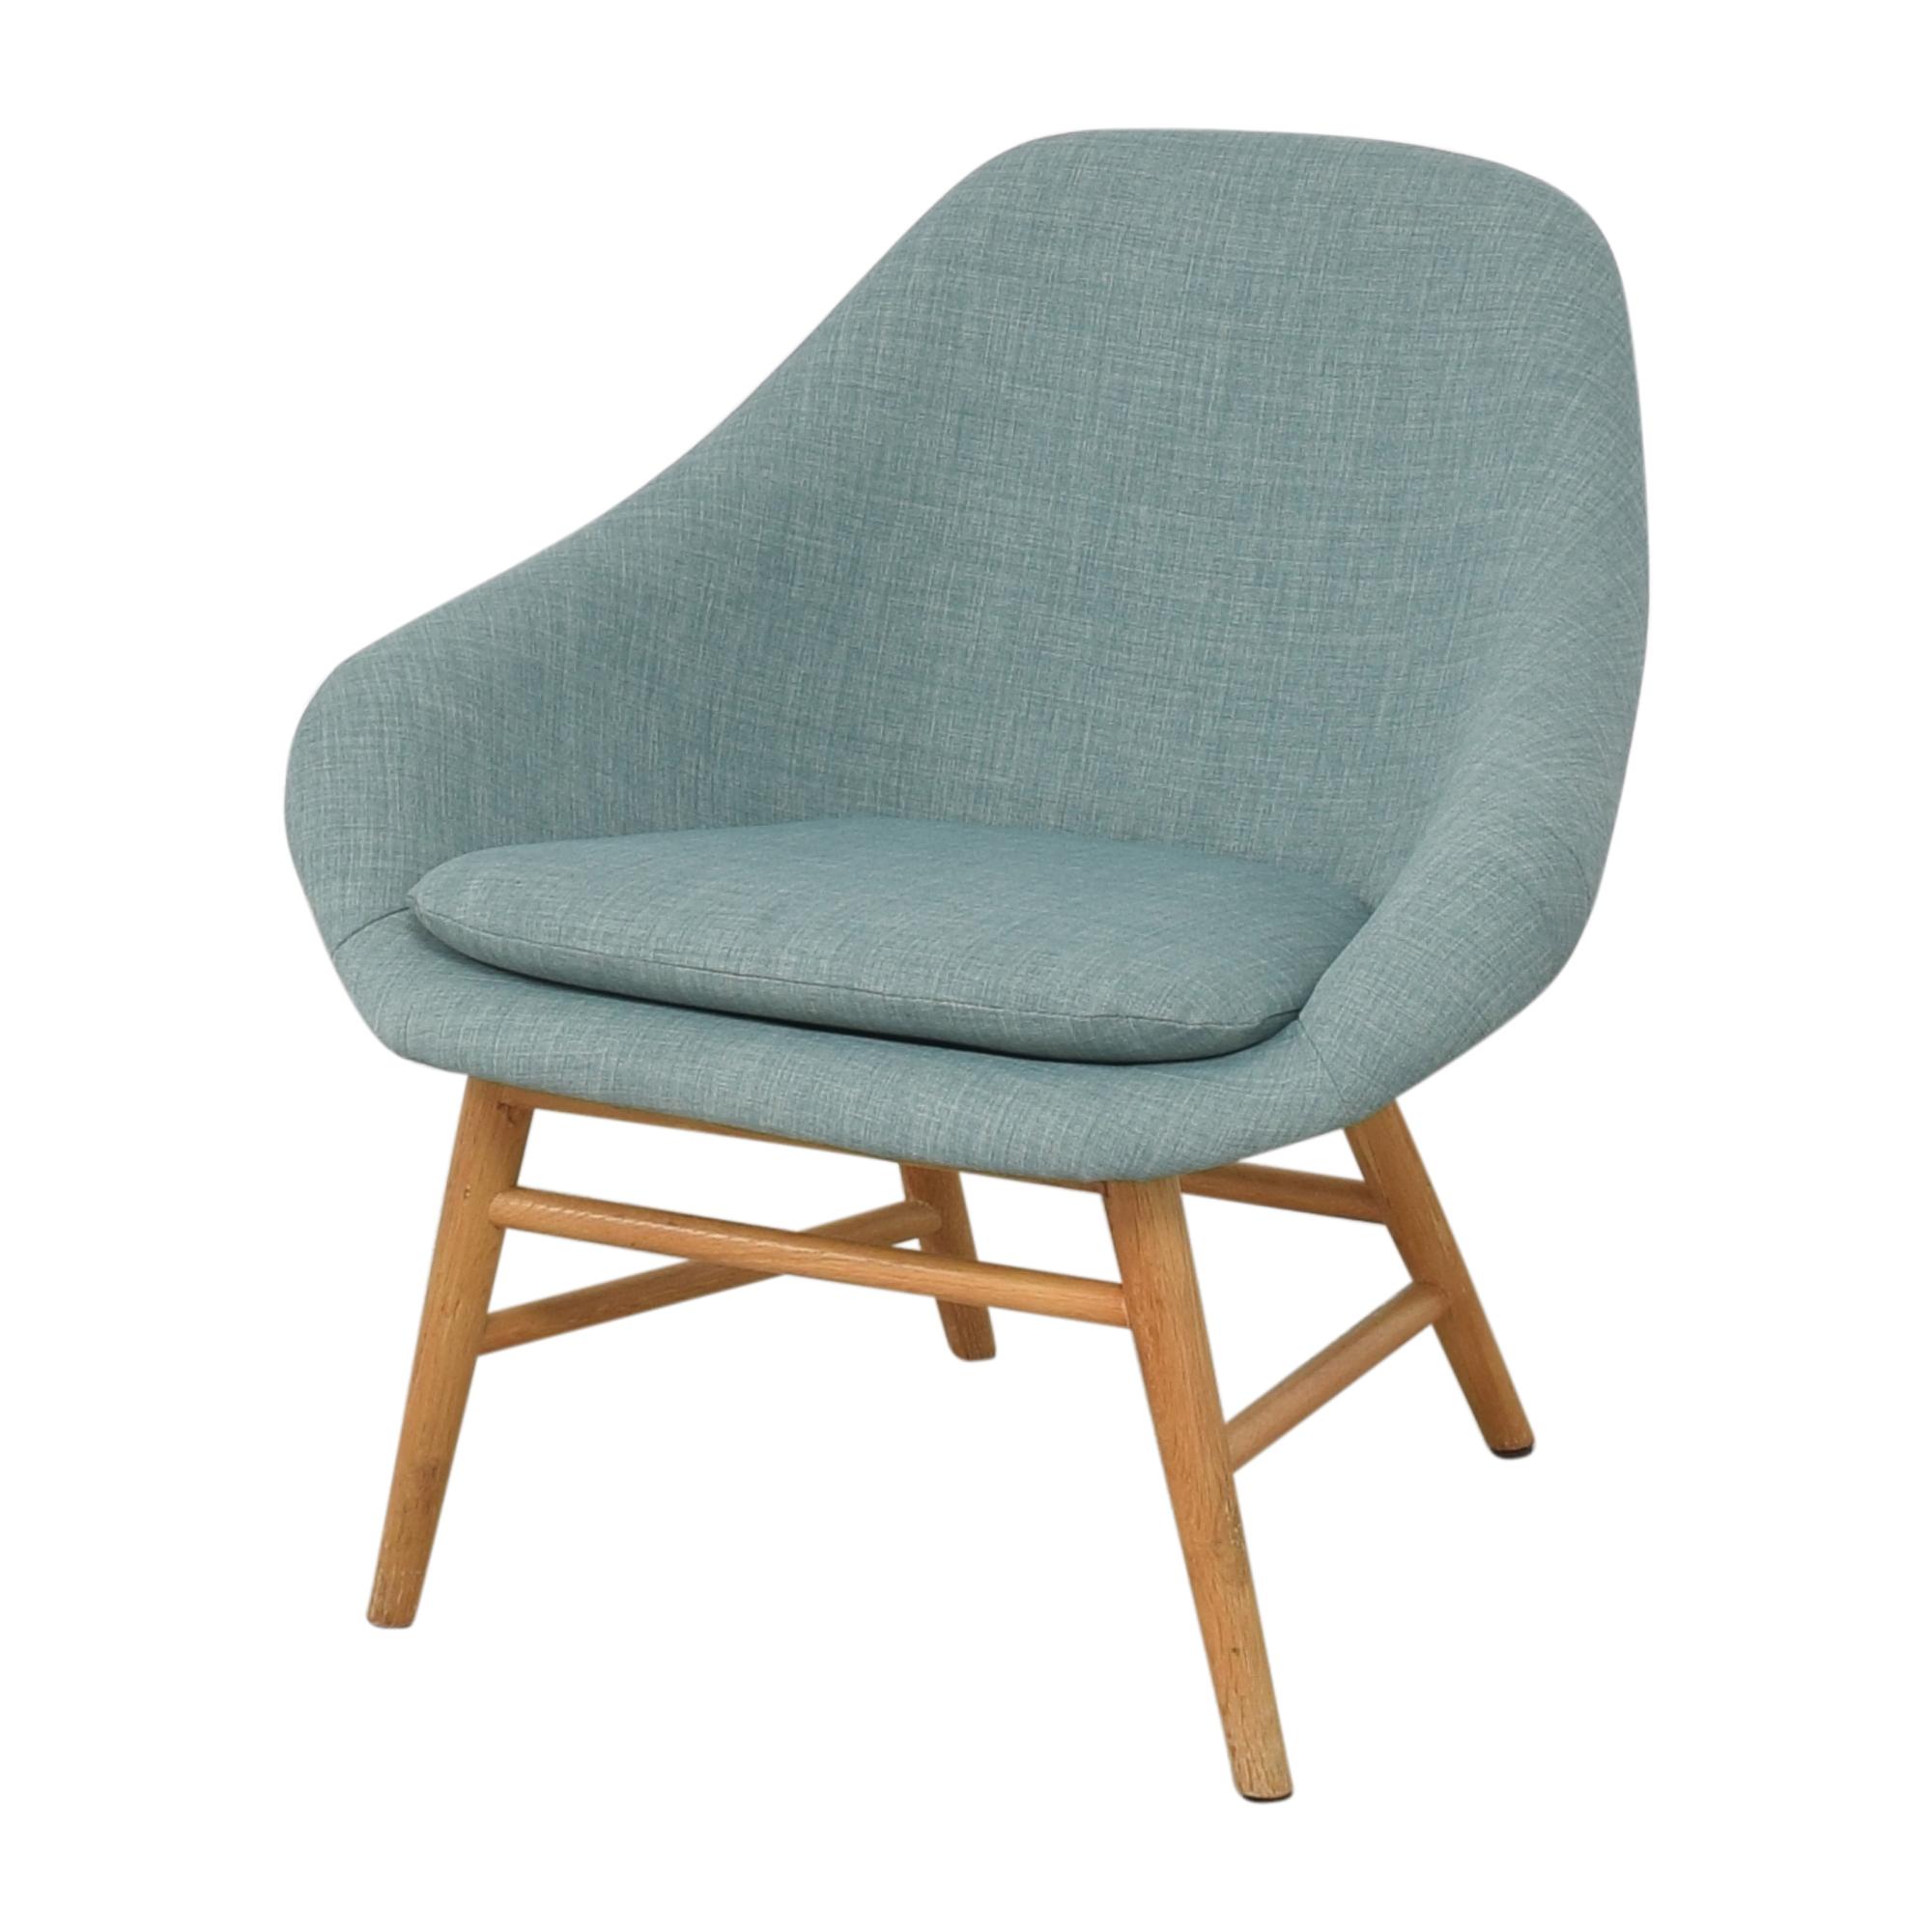 West Elm West Elm Mylo Chair nj